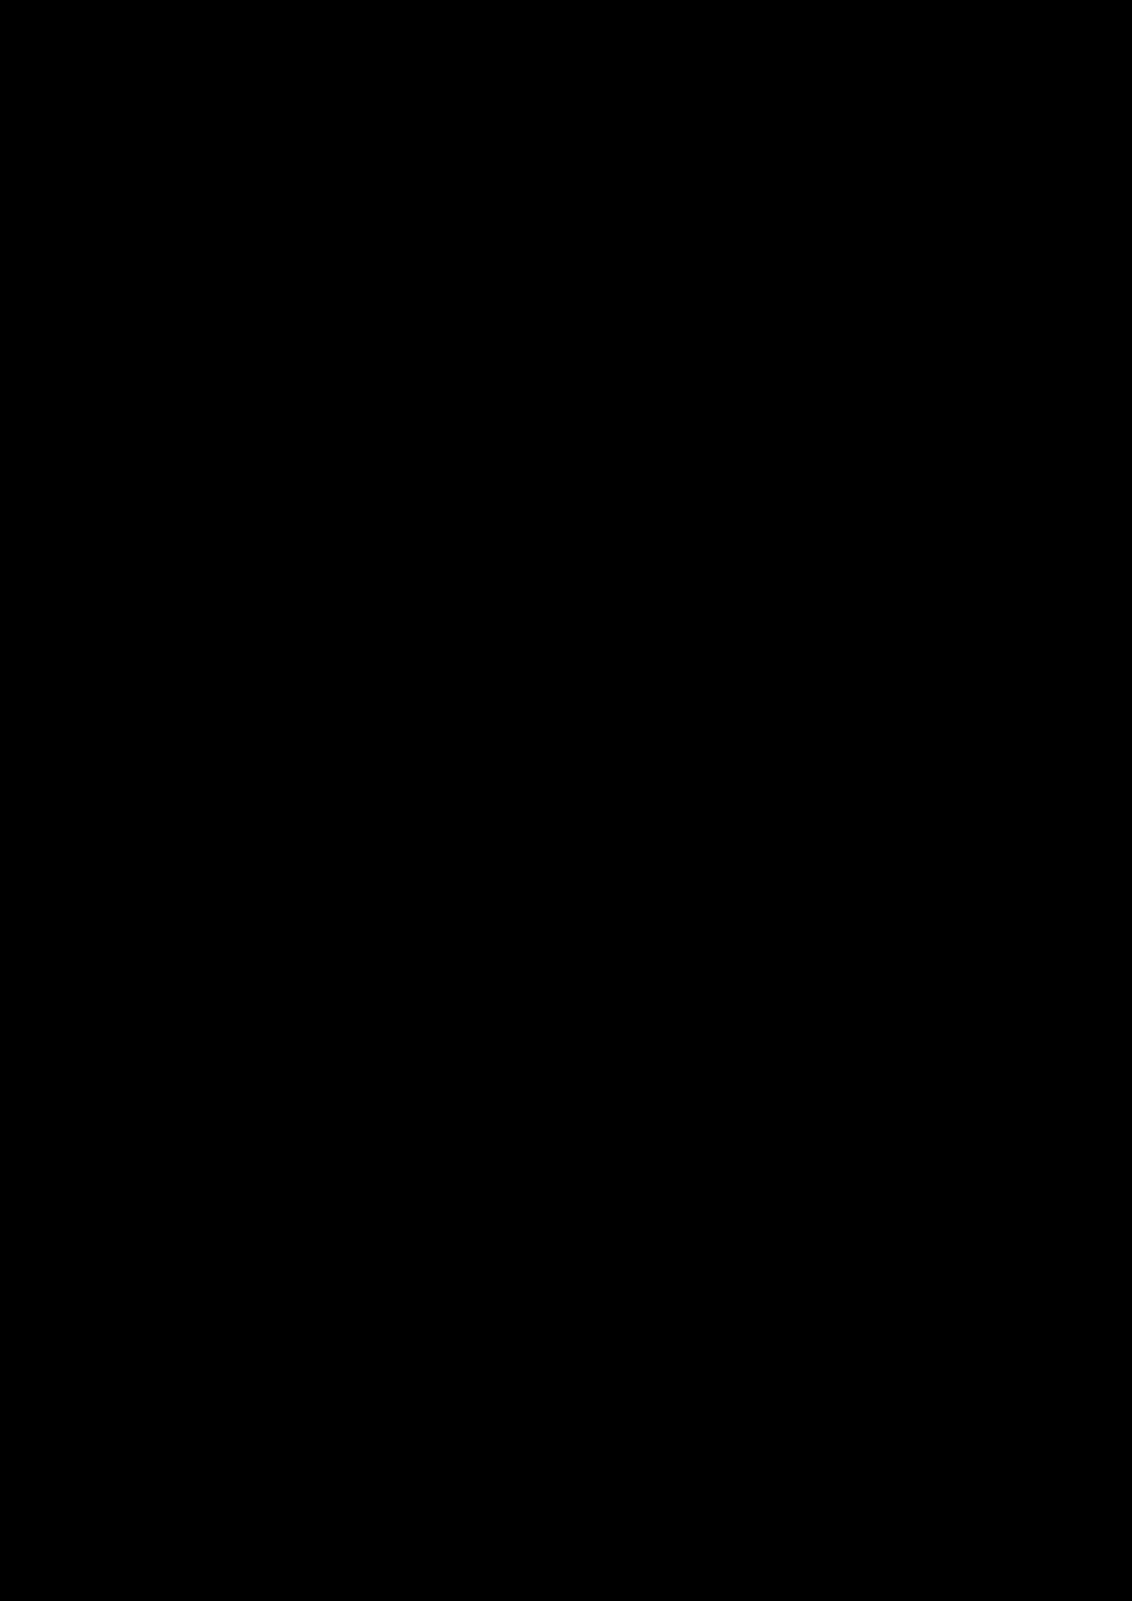 Okean Pustotyi slide, Image 4